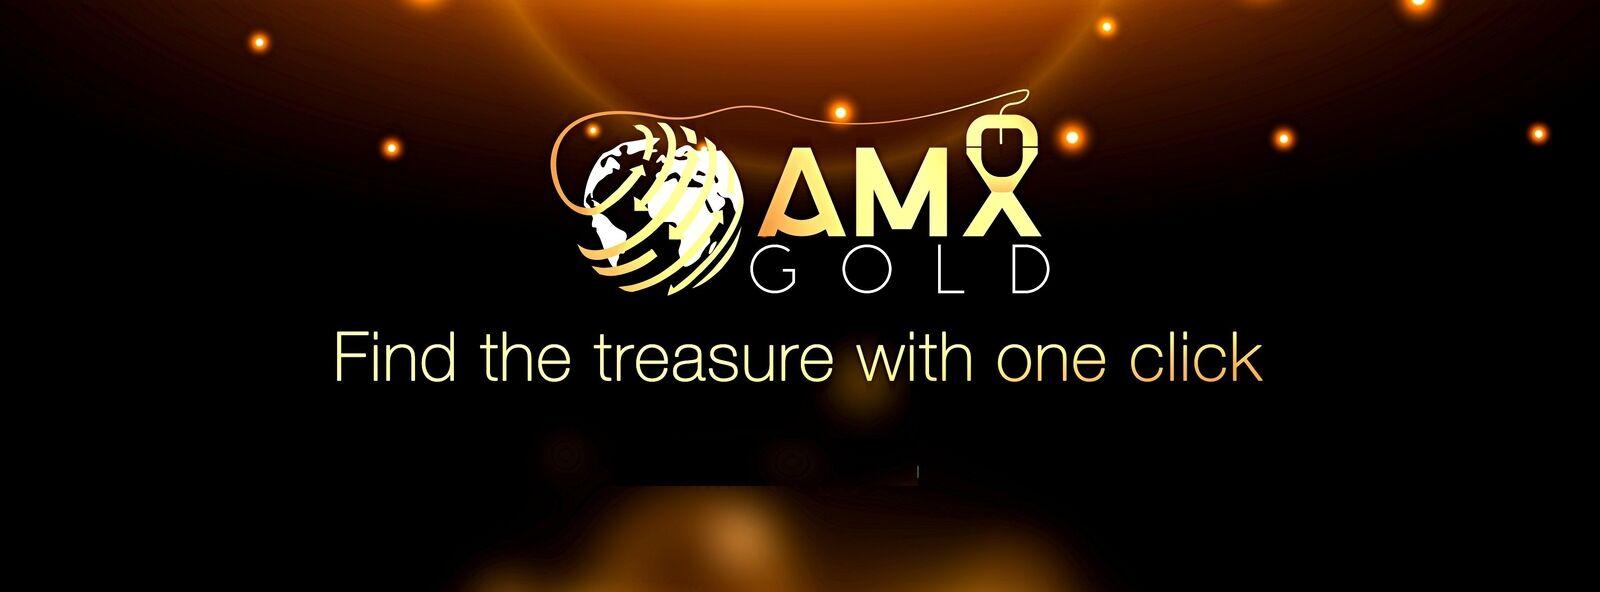 AMXgold